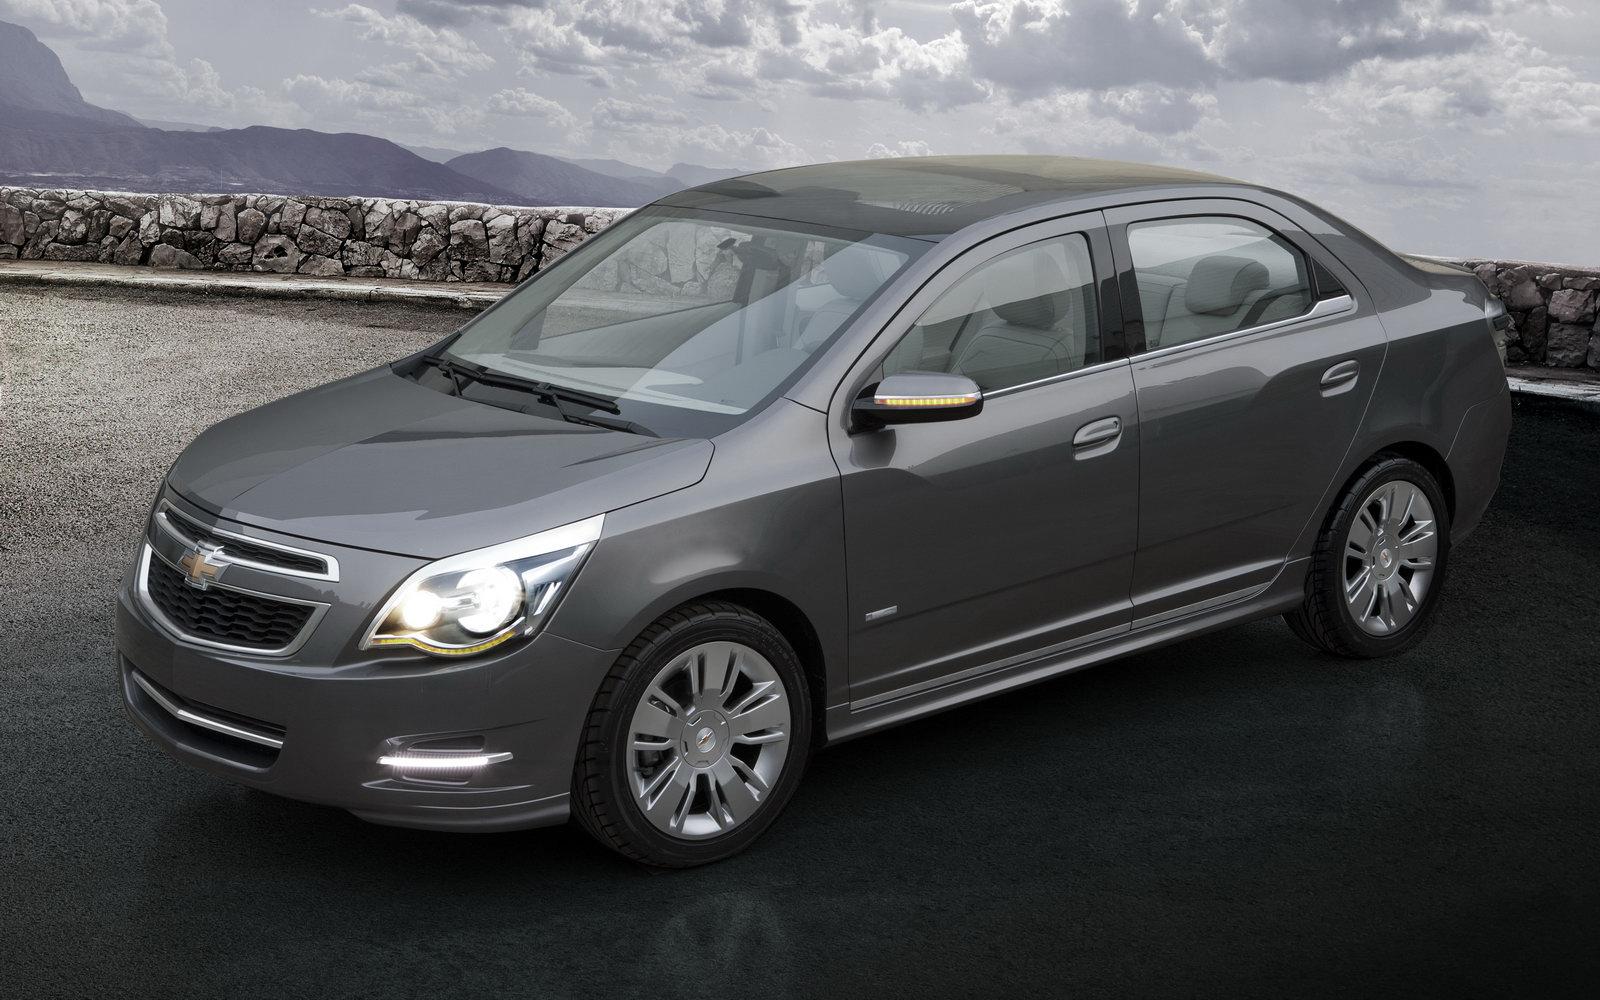 Chevrolet cobalt sedan concept